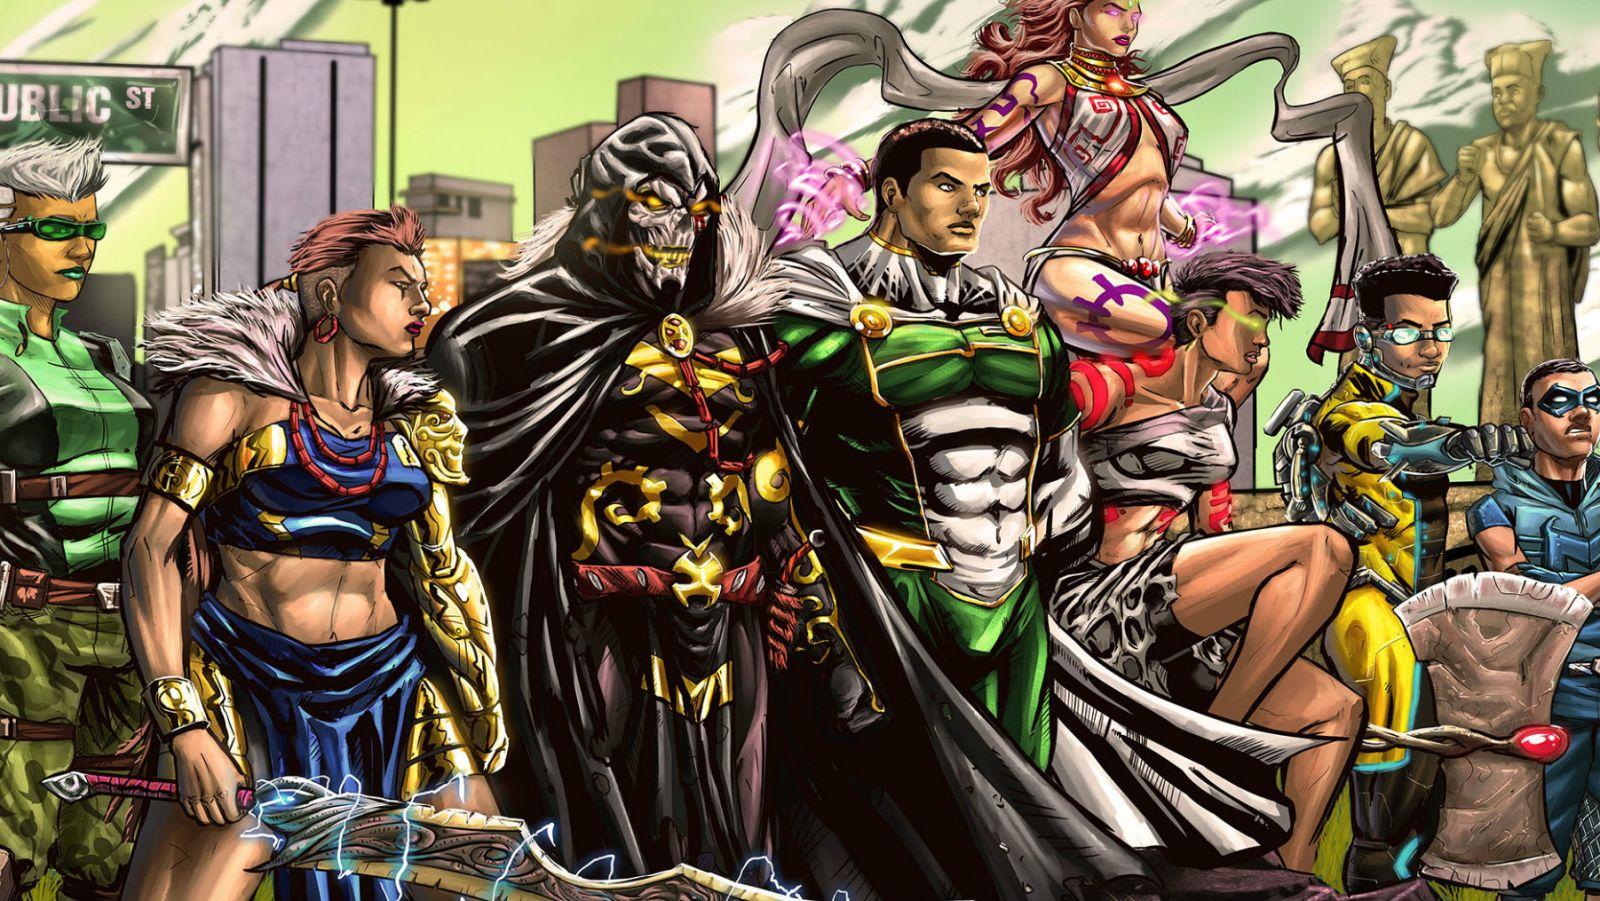 Nigerian Comics Startup Creating African Superheroes